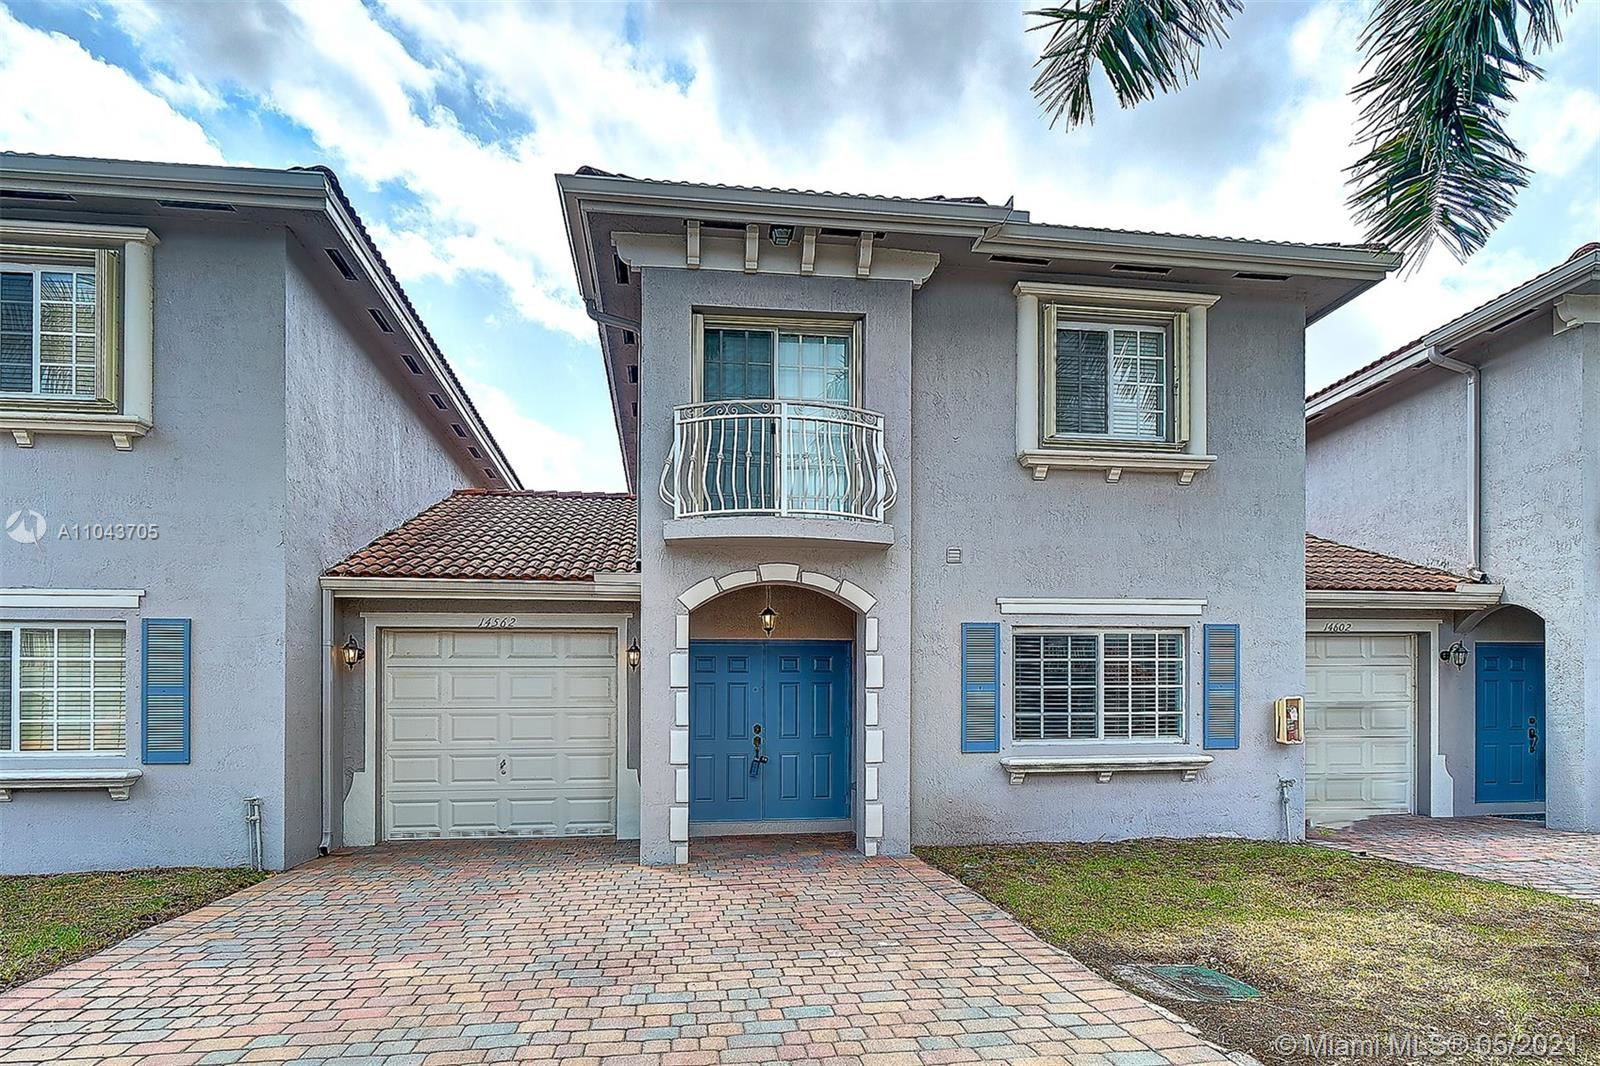 Photo of 14562 SW 29 Terrace #14562, Miami, FL 33175 (MLS # A11043705)